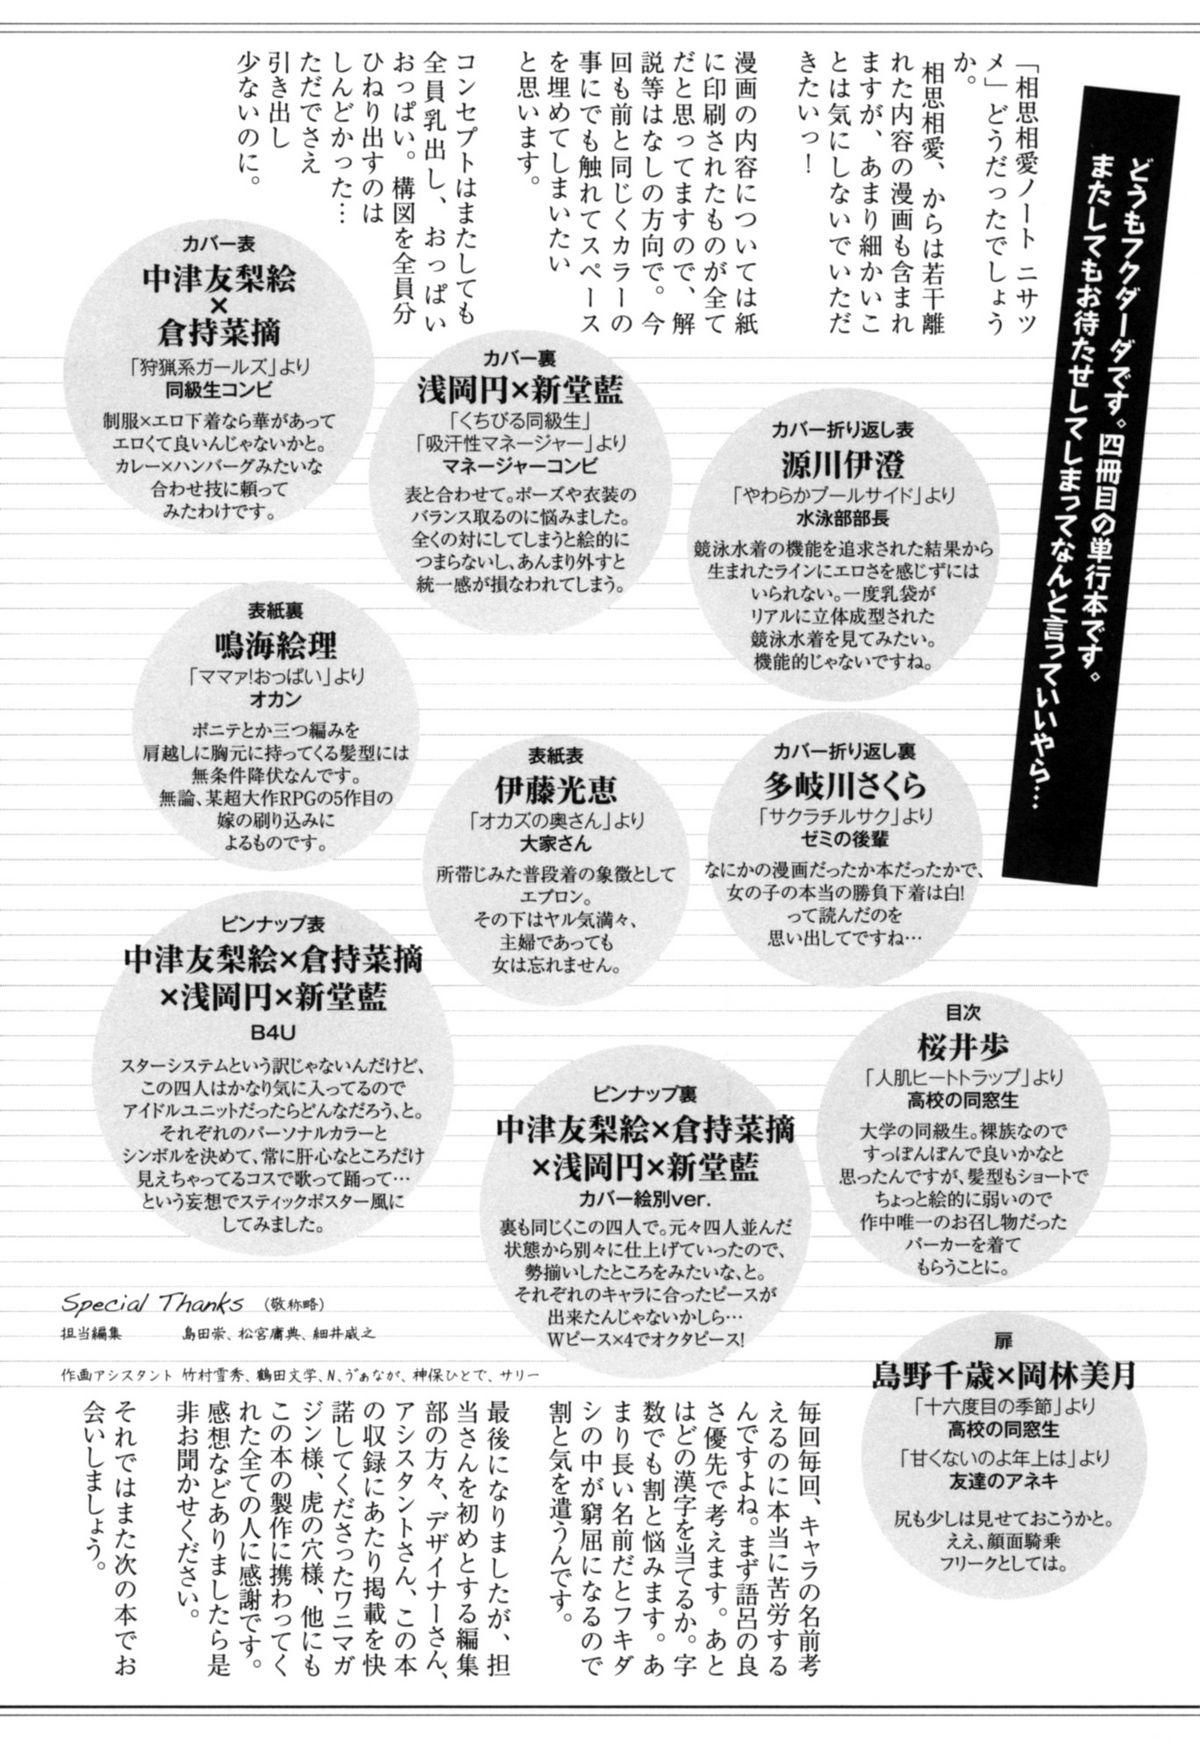 Soushisouai Note Nisatsume 230